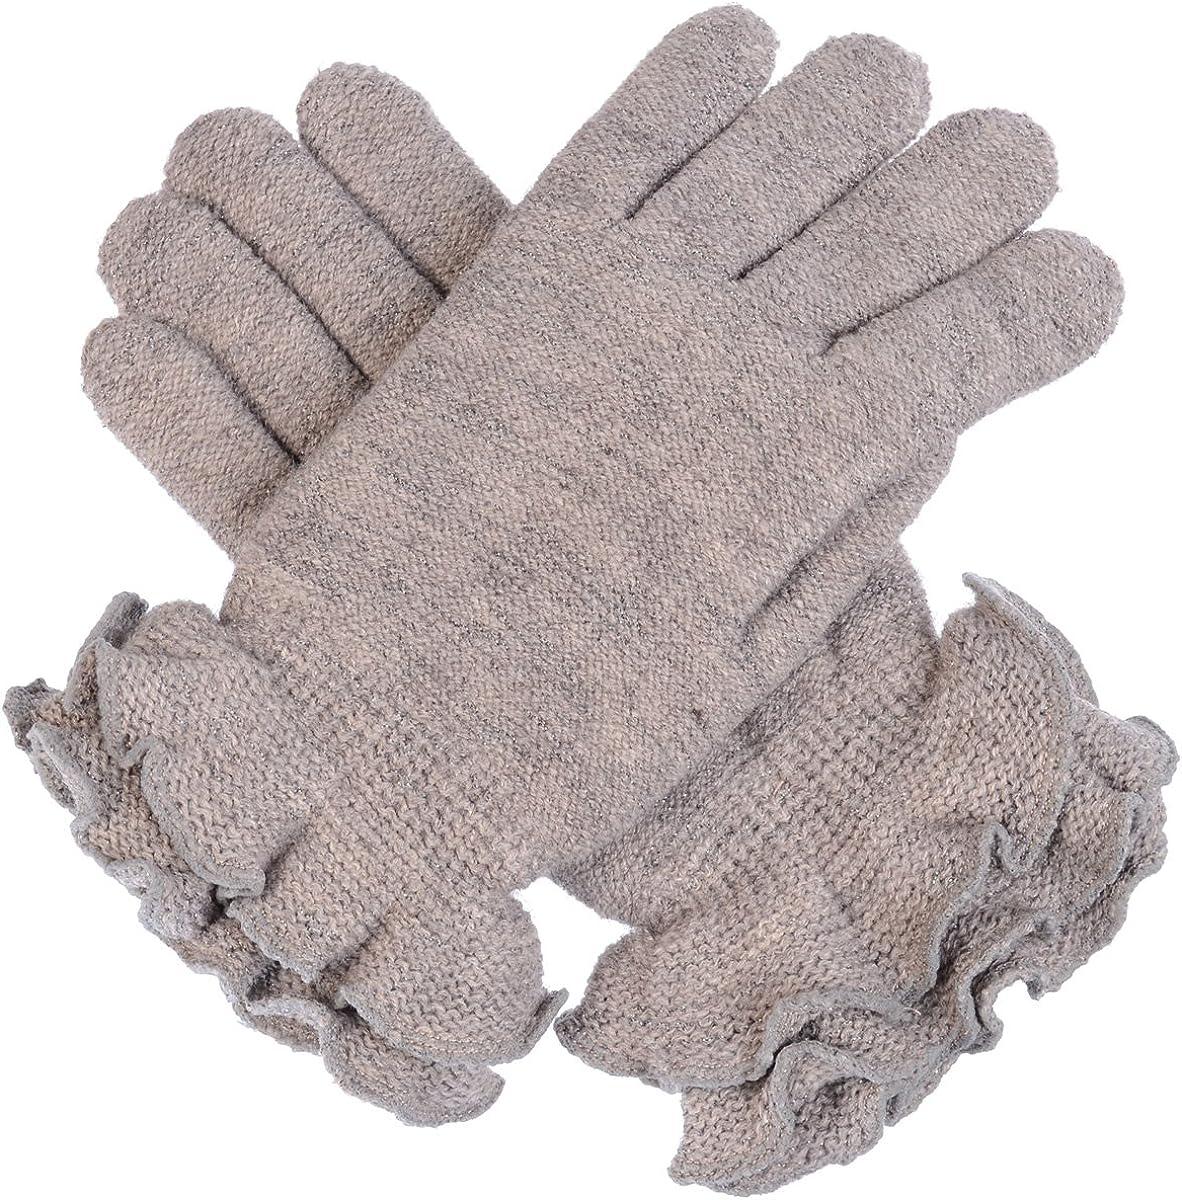 BYOS Women's Winter Cozy Plush Faux Fur Fleece Lined Knit Gloves W/Decorated Cuff